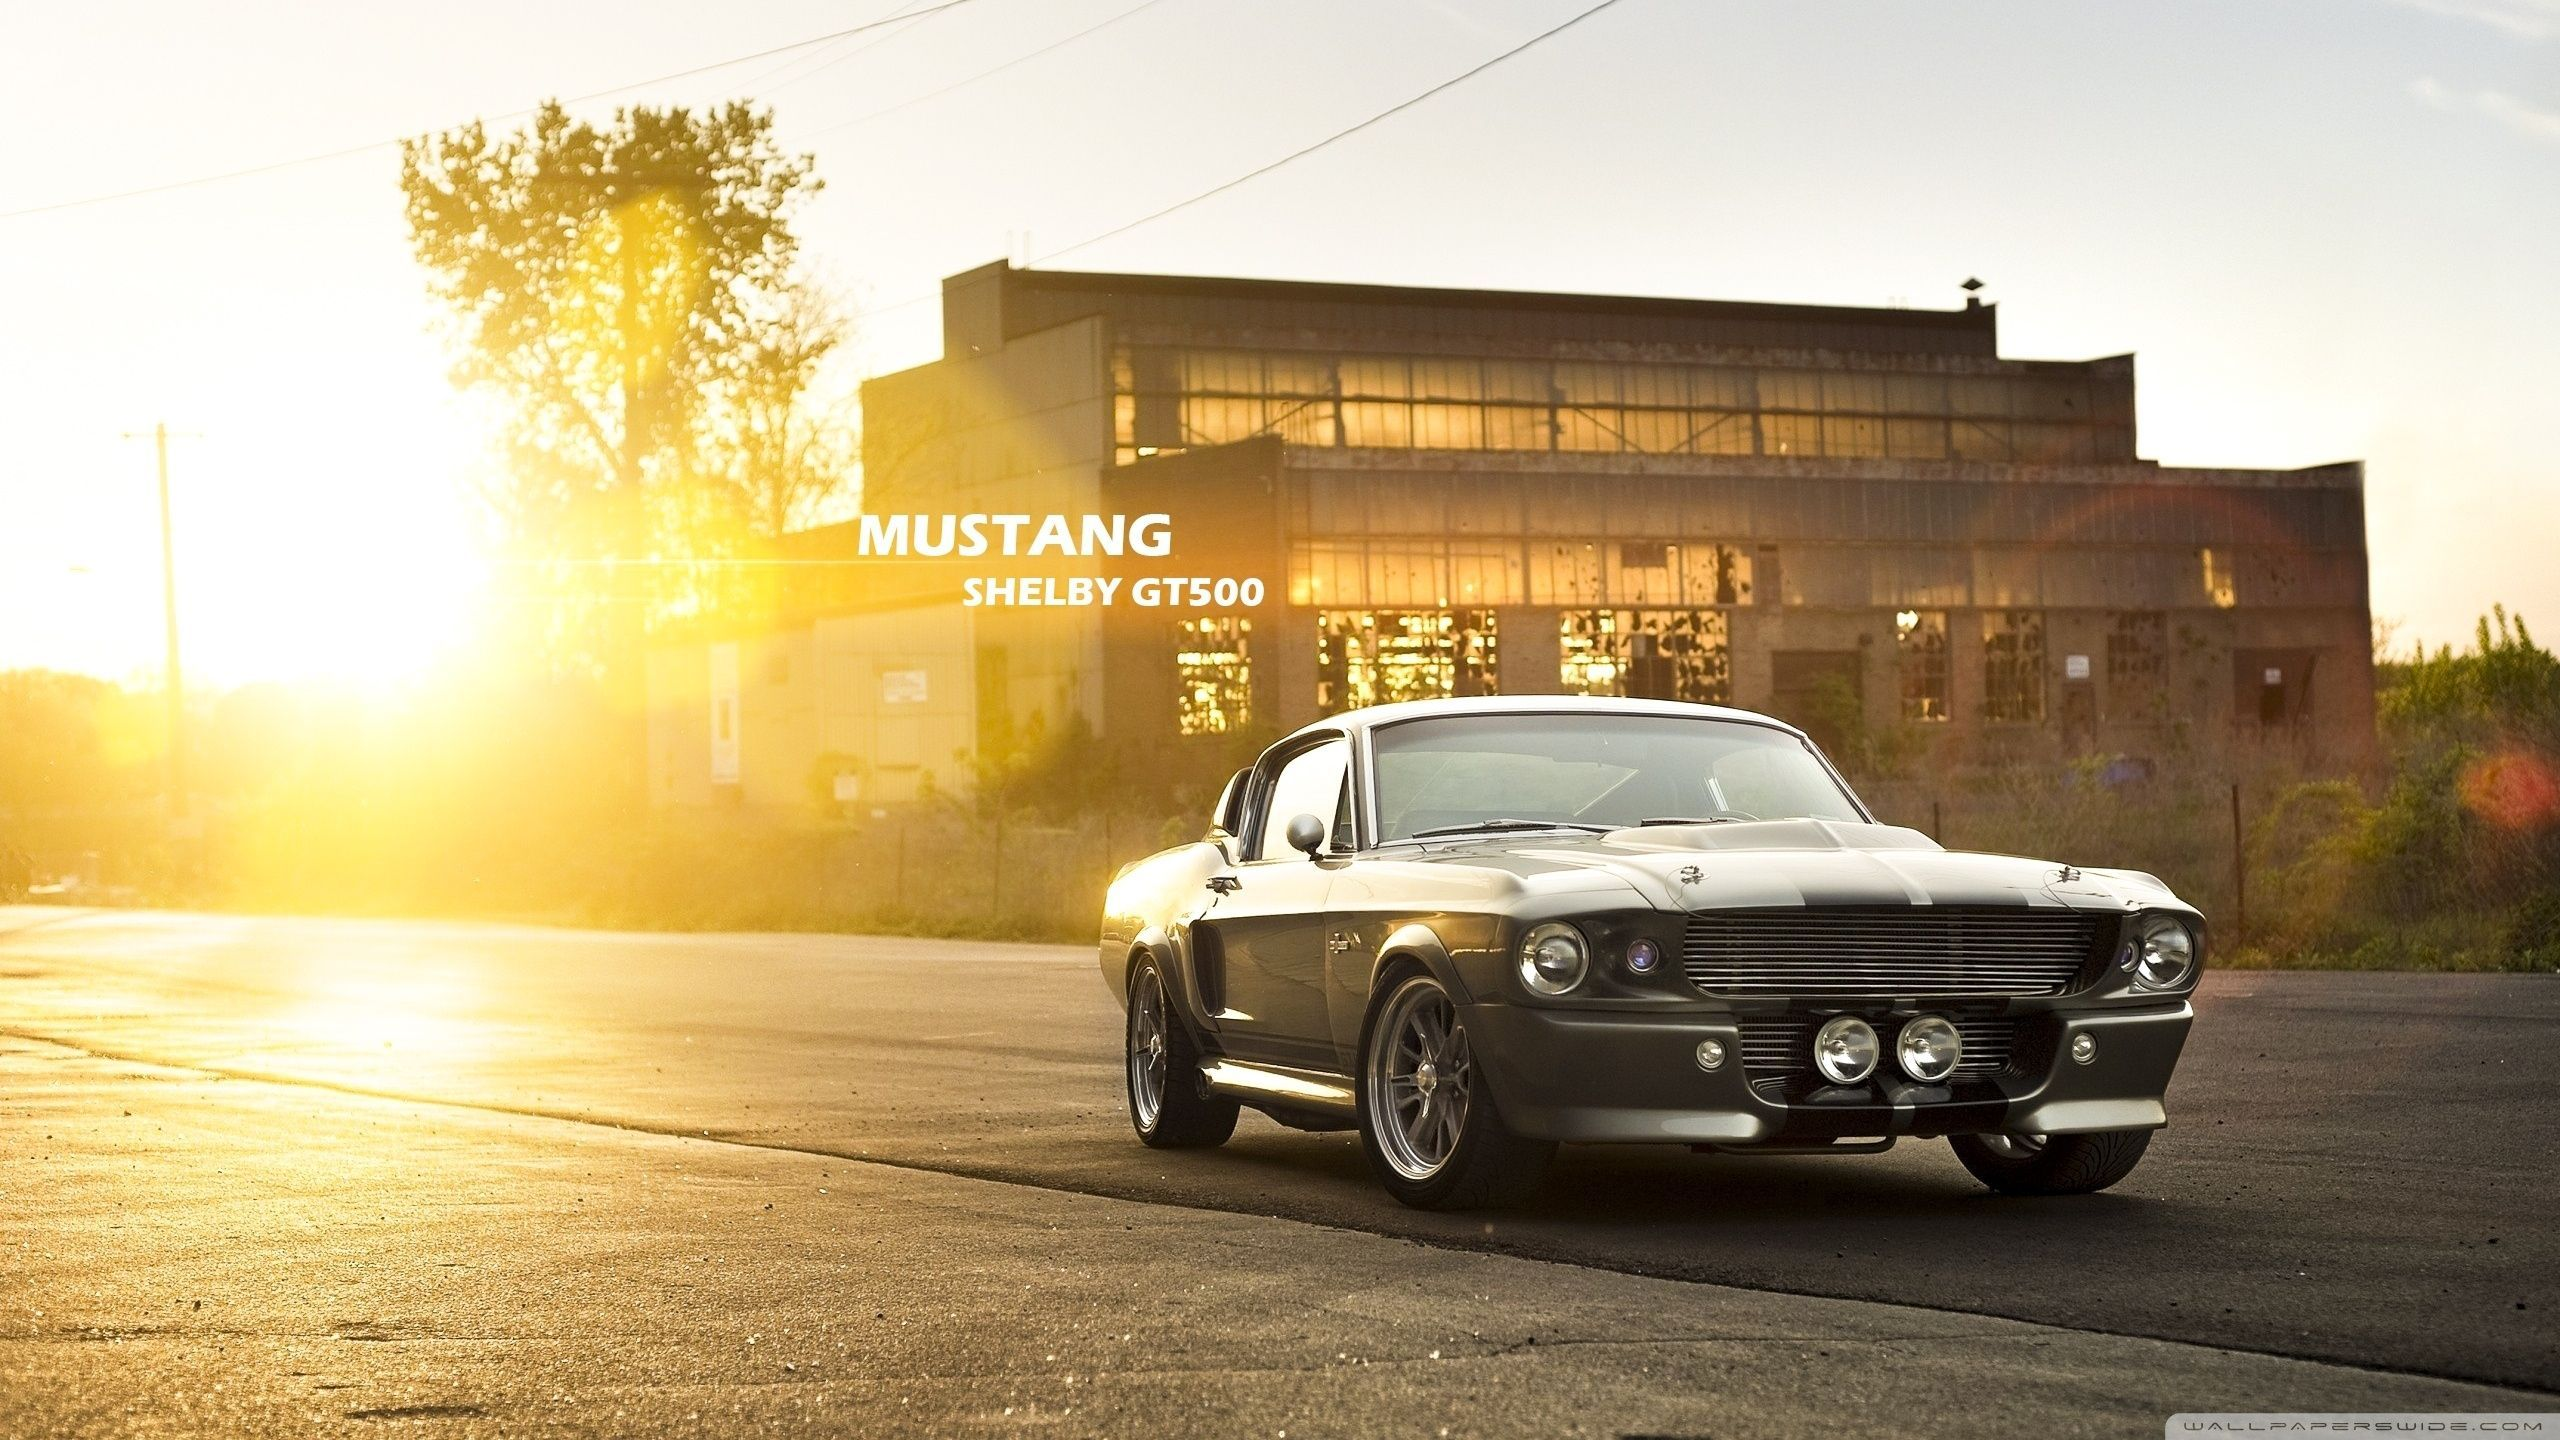 Hd Wallpapers 1080p Muscle Cars Hd Wallpaper 1080p Muscle Cars Hd Wallpapers 1080p Muscle Cars Car Wallpapers Classic Cars Mustang Wallpaper